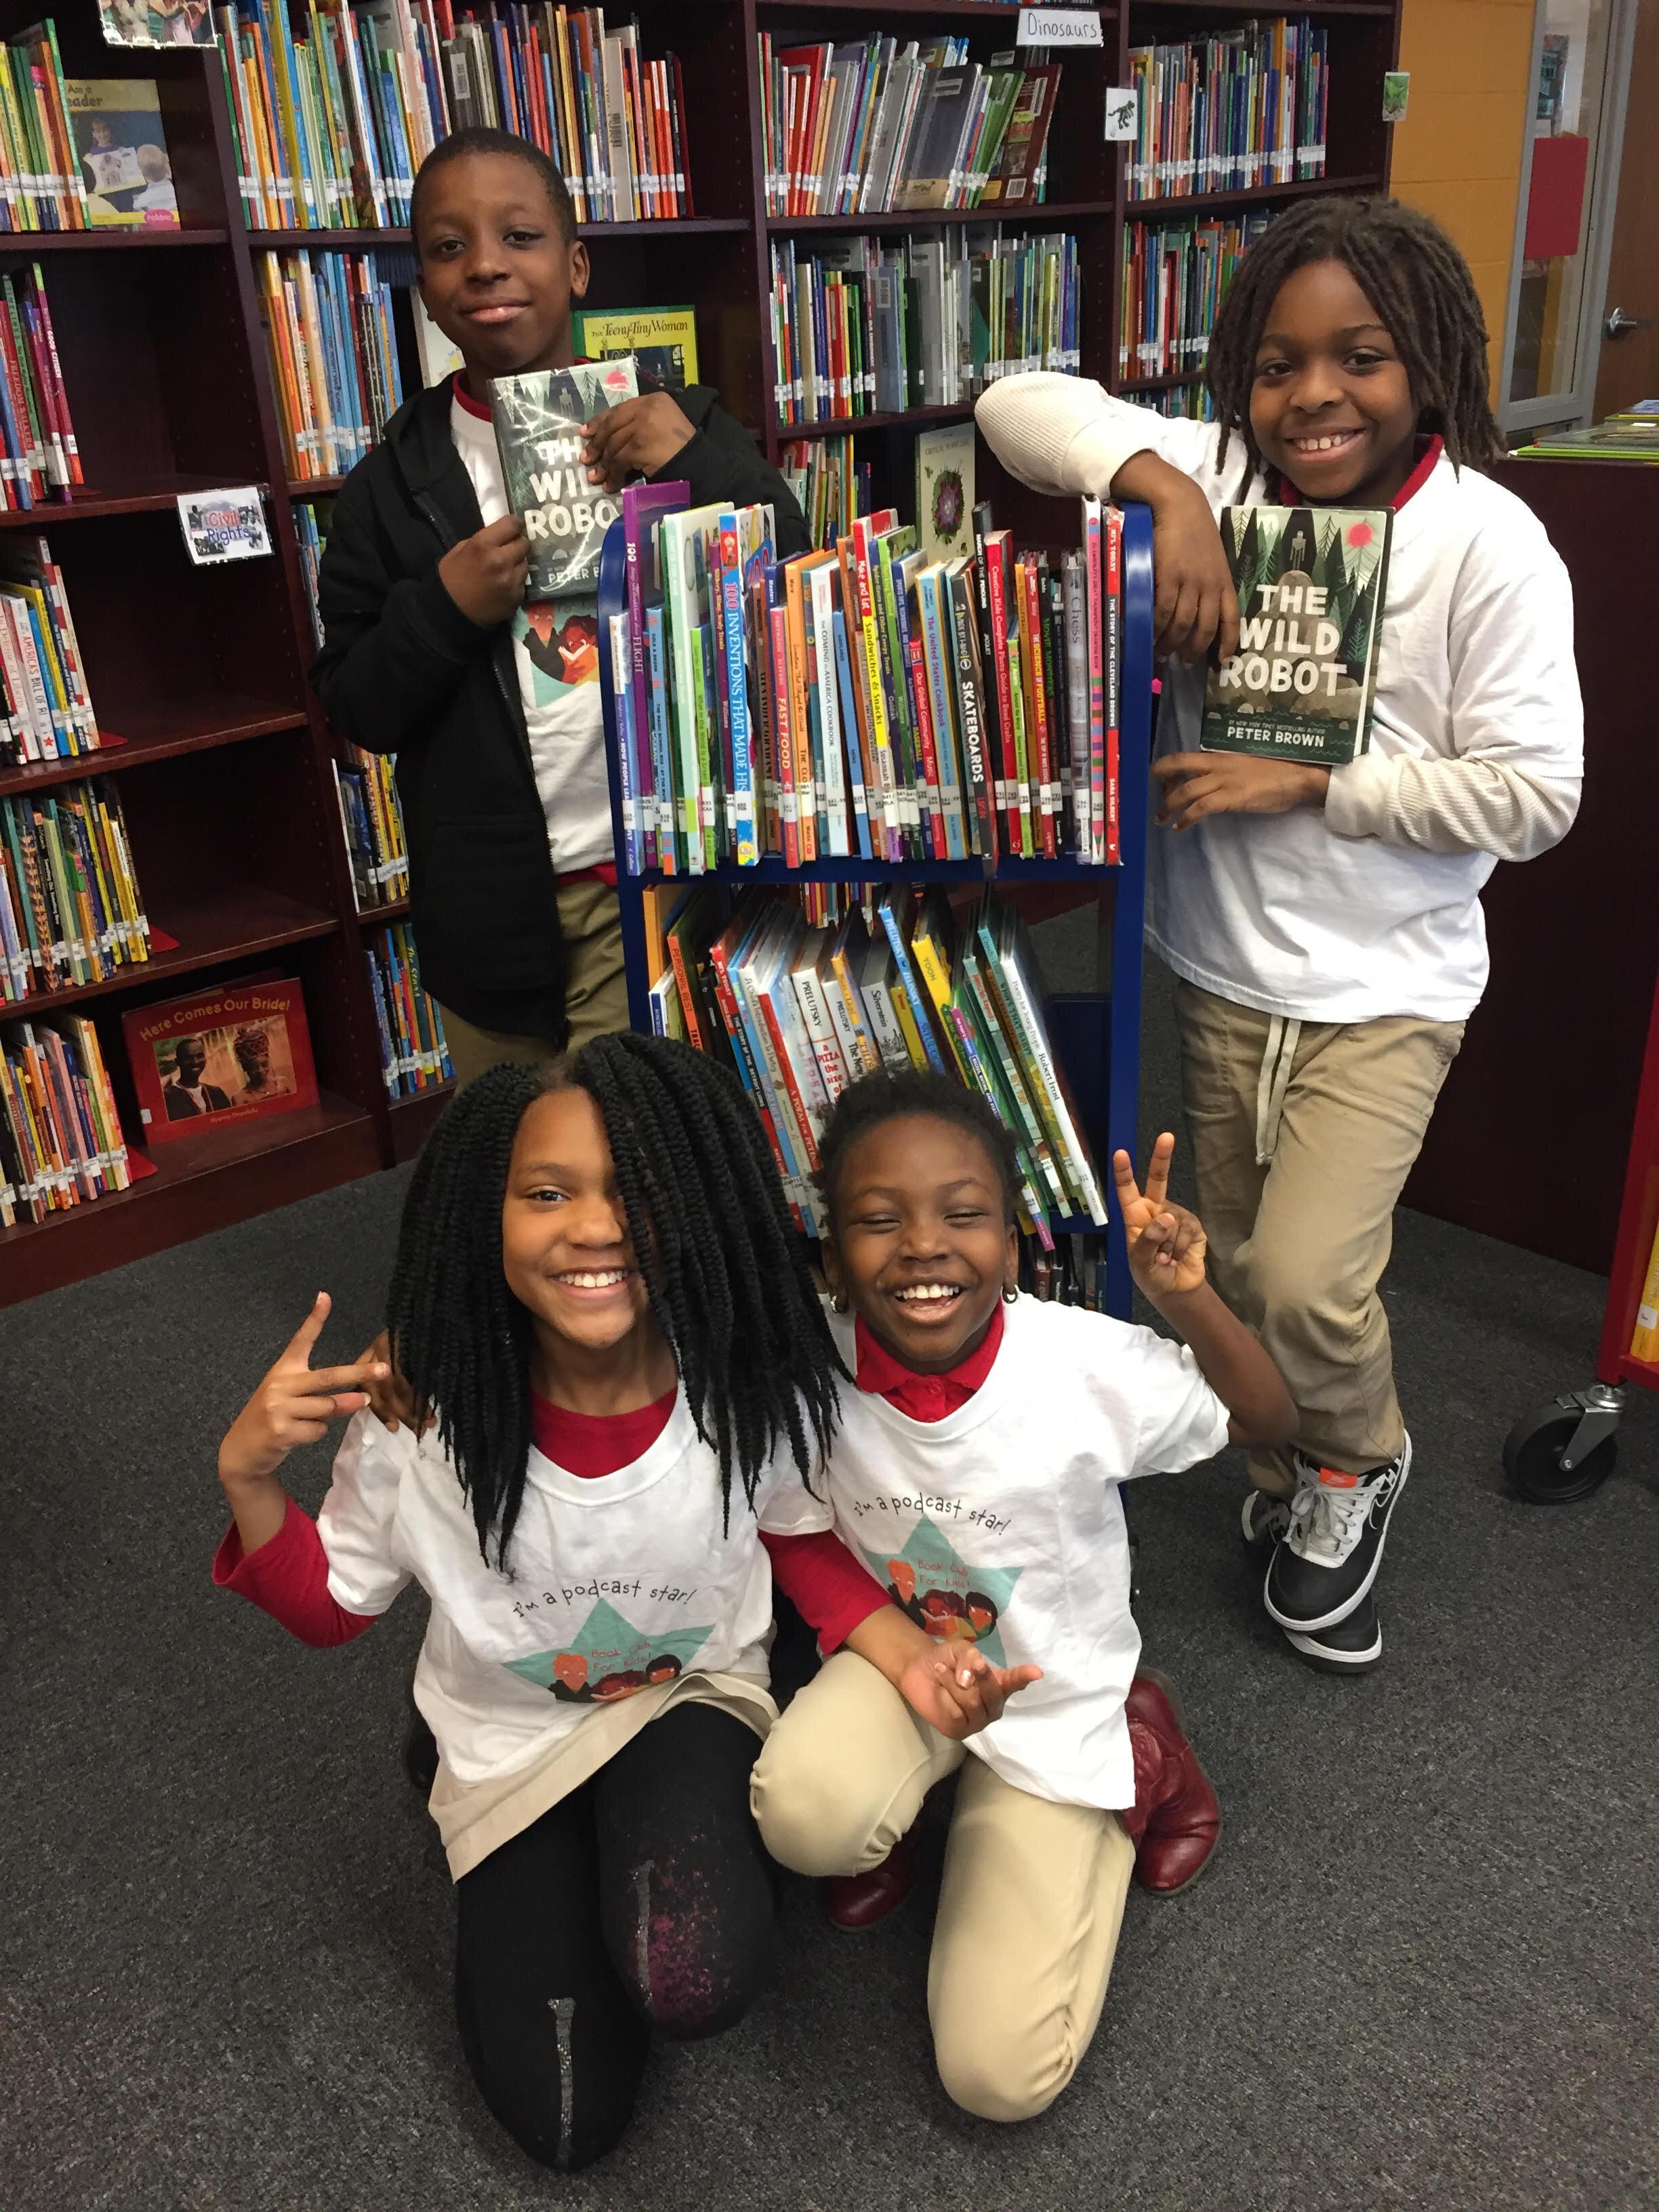 Jamar, Donald, Zyanna, and Morayooluwa attend Flora Hendley Elementary School in Washington, DC